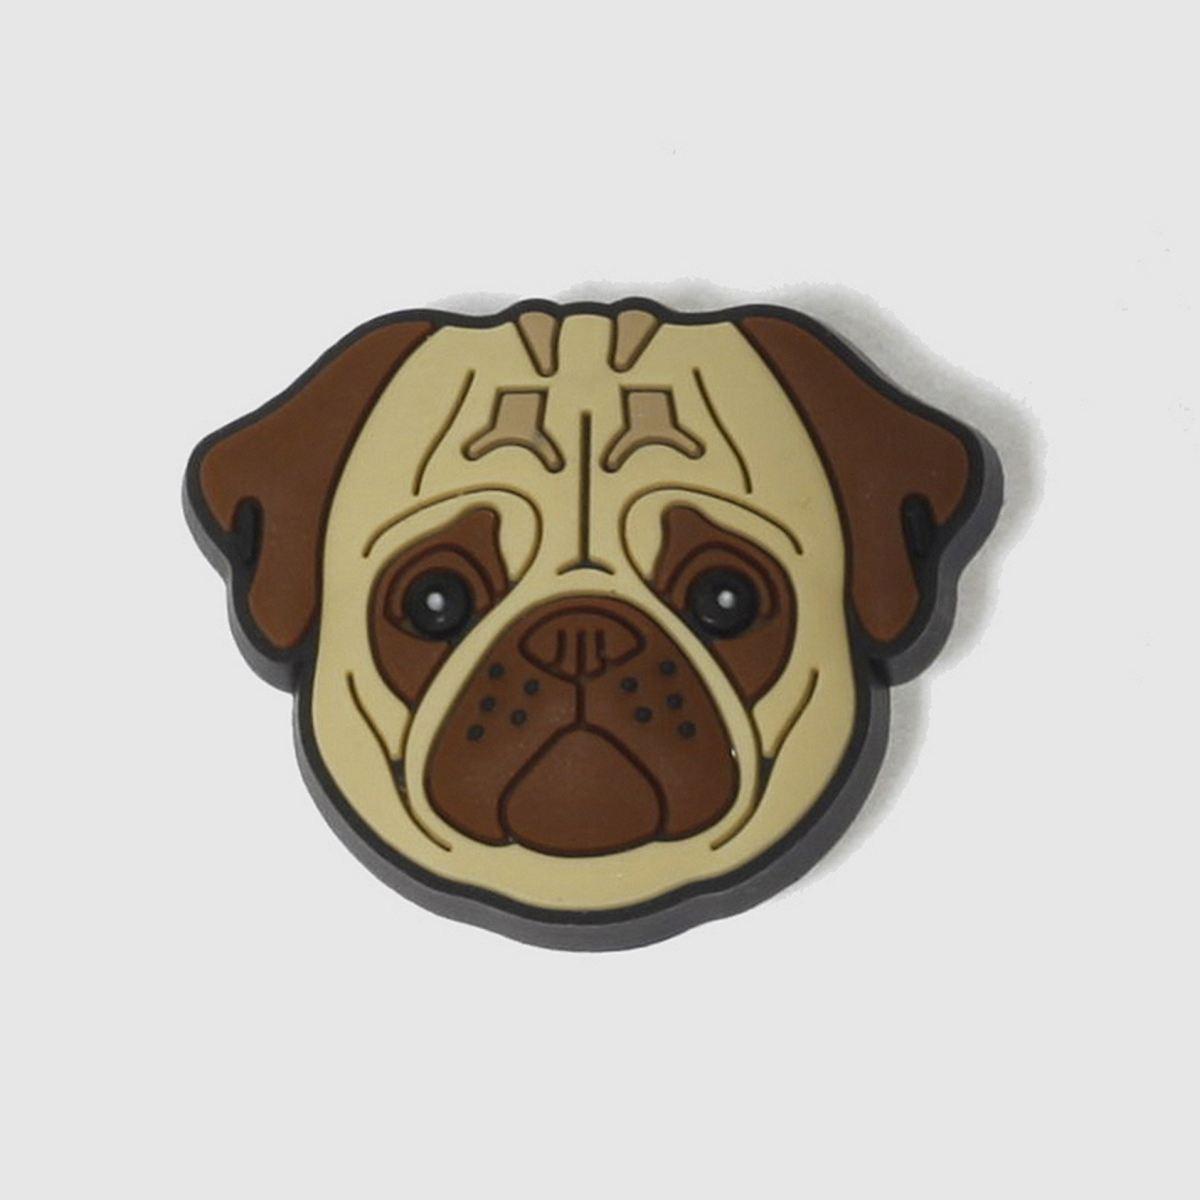 jibbitz Jibbitz Beige & Brown Pug Face